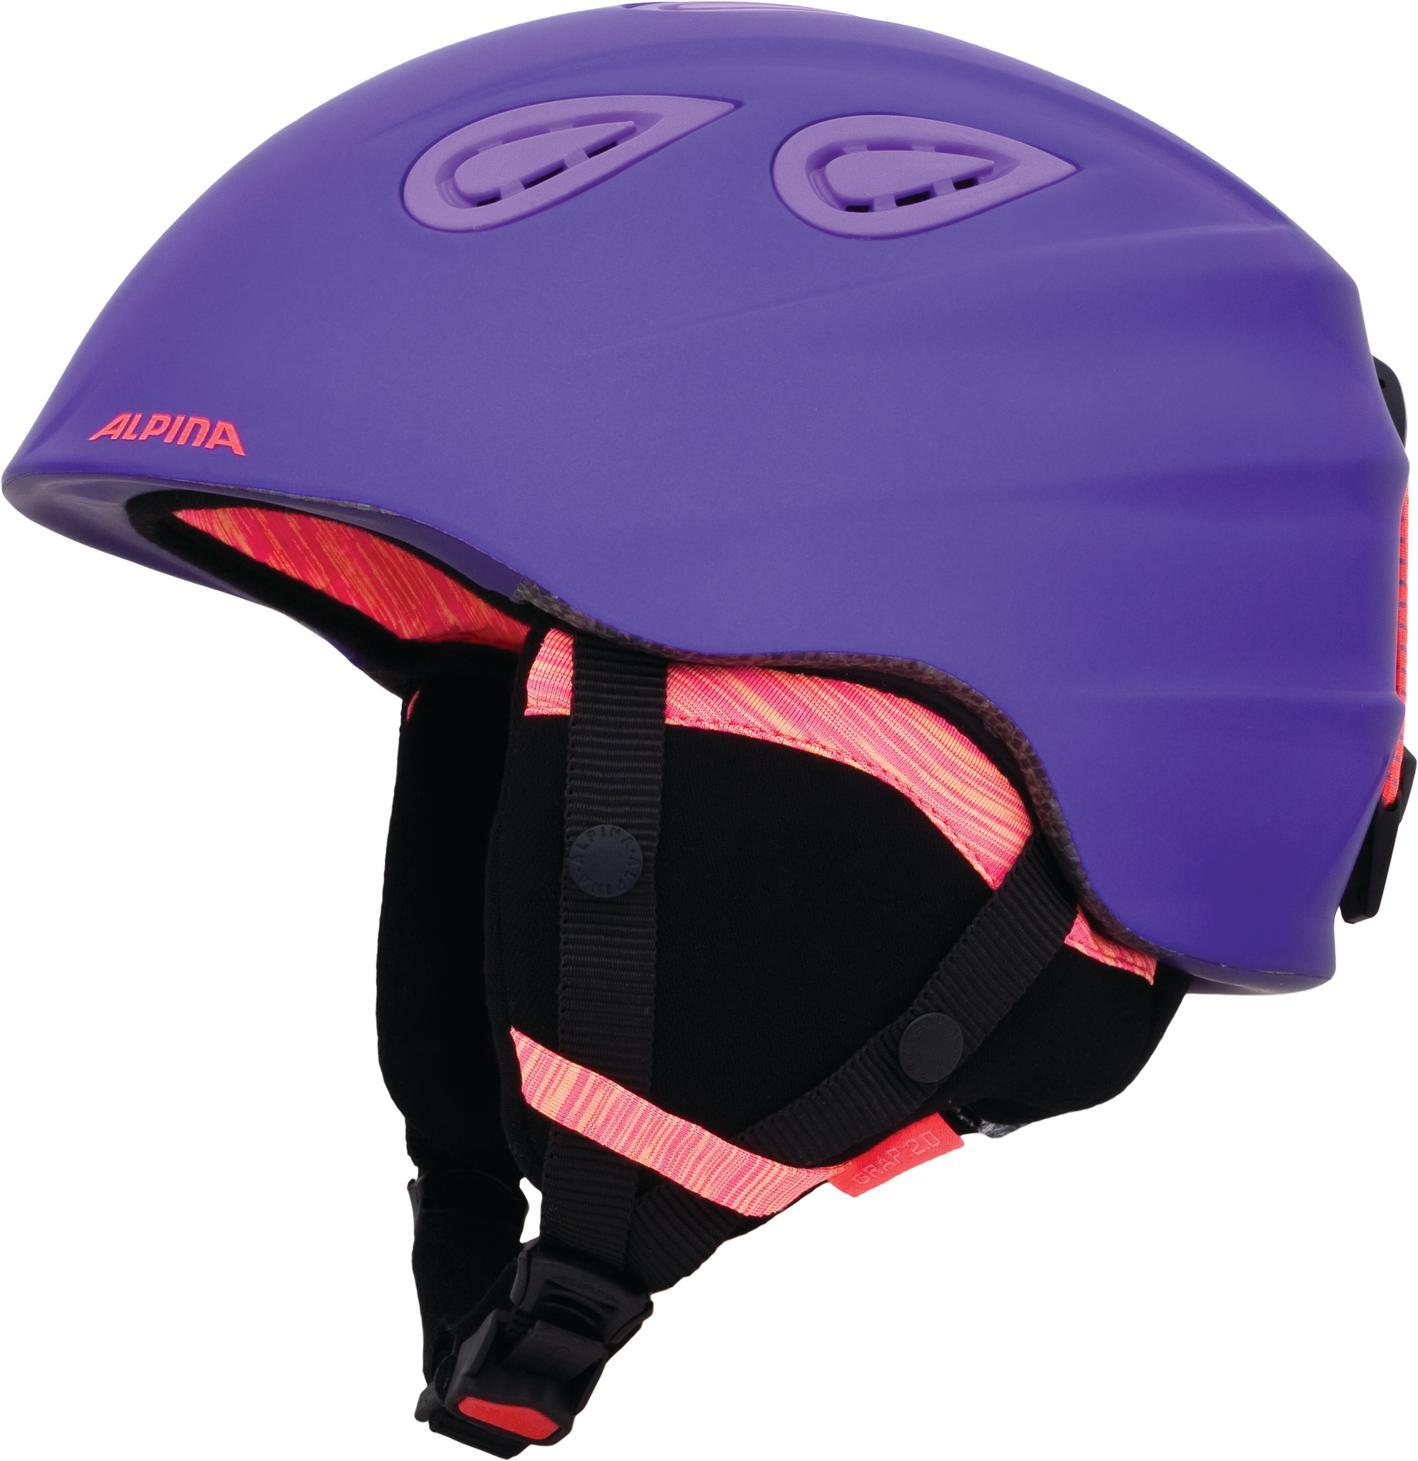 alpina-grap-2-0-le-skihelm-gr-ouml-szlig-e-54-57-cm-52-royal-purple-matt-